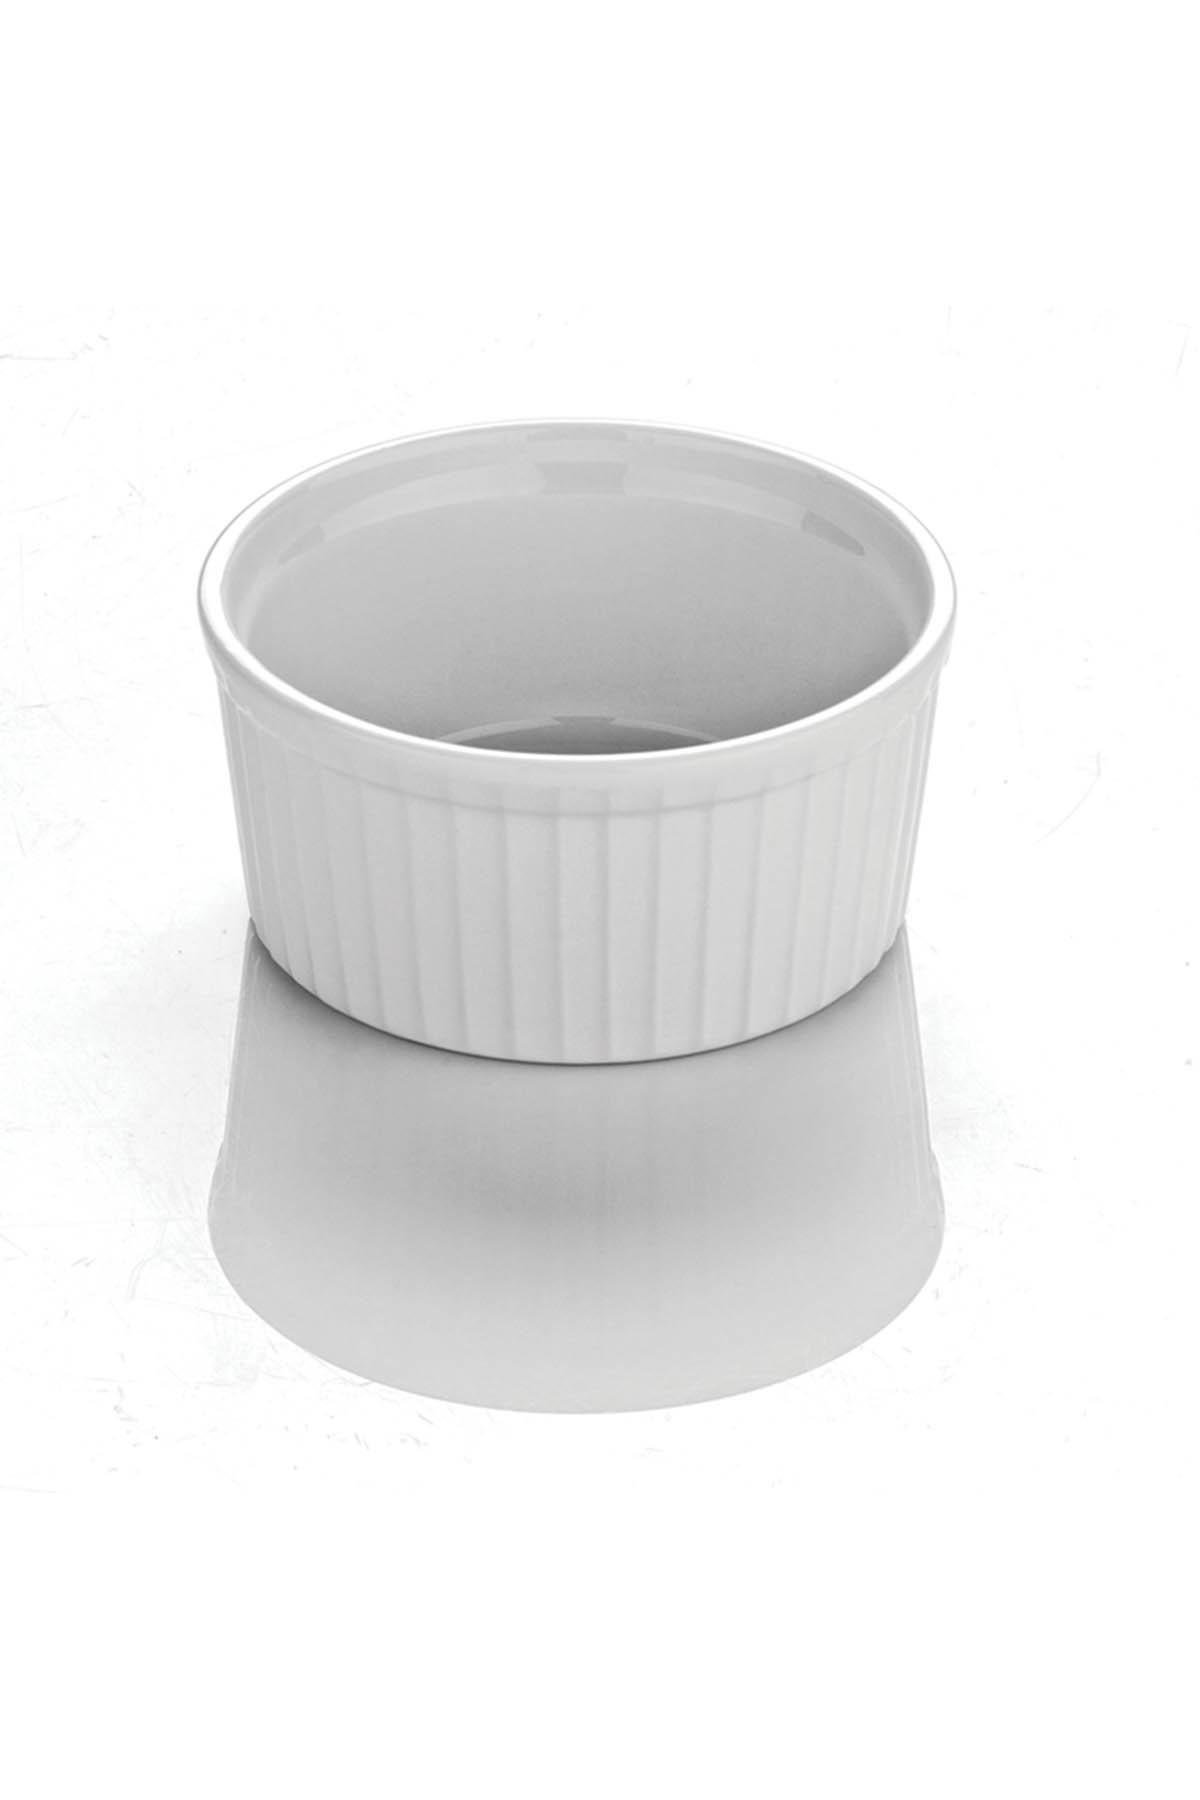 Kütahya Porselen - Sufle Kasesi 9 Cm Dekorsuz